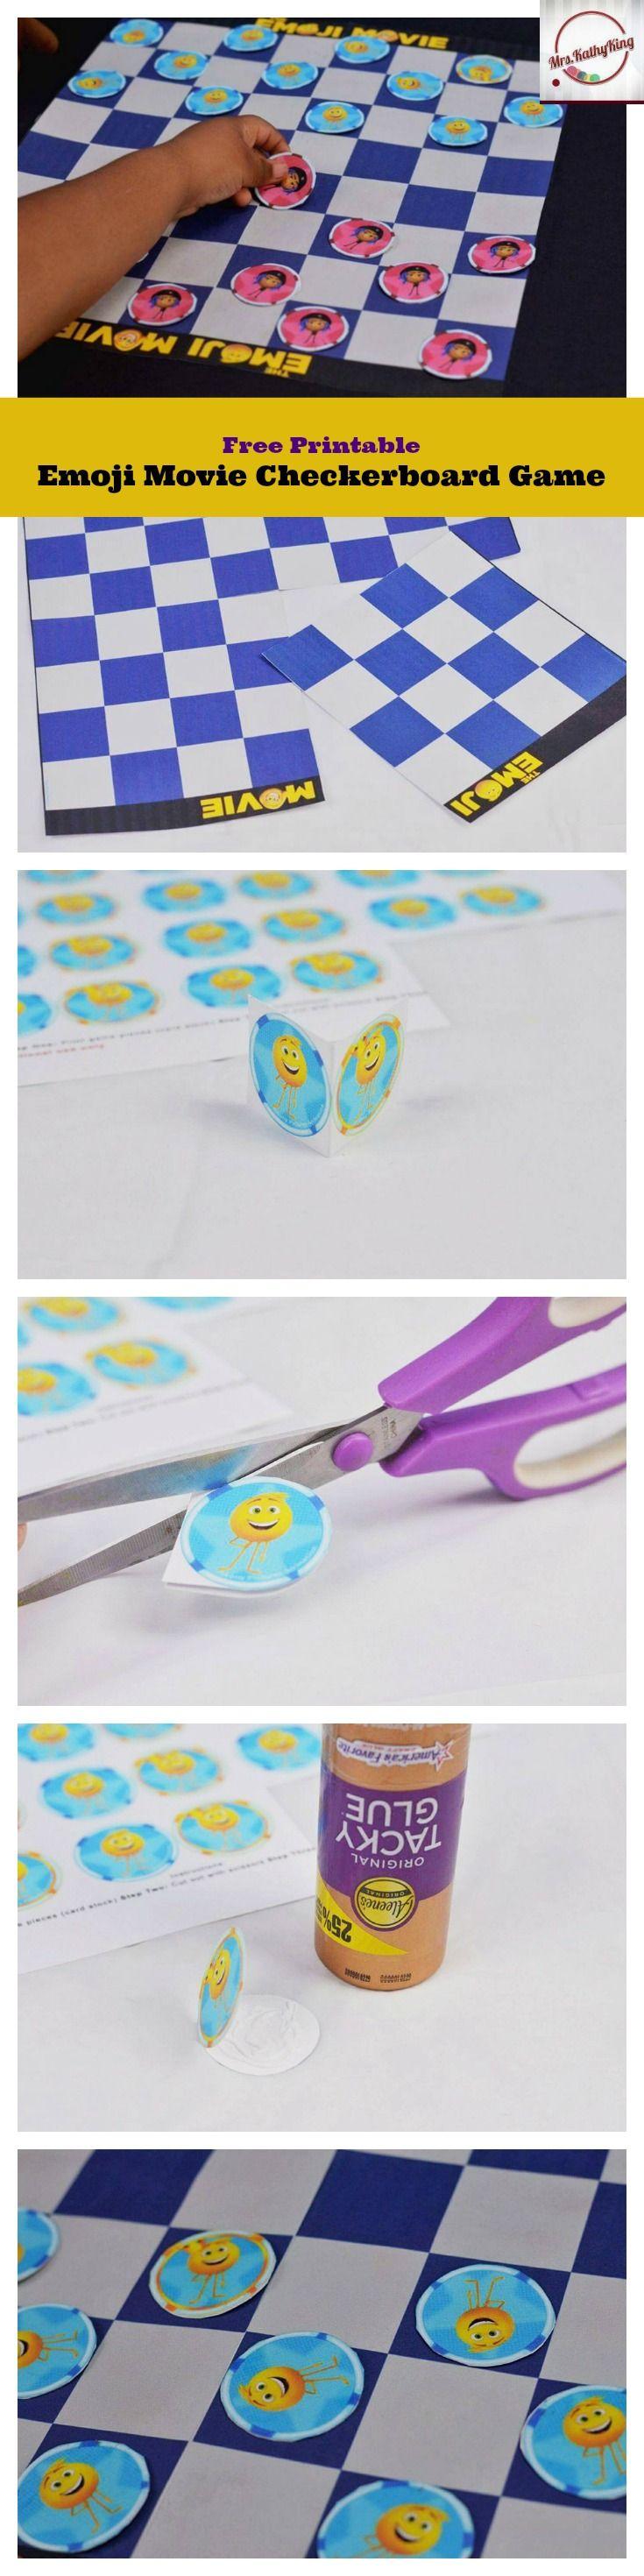 http://www.mrskathyking.com/free-printable-emoji-movie-checkerboard-game-theemojimovie-emojimovie/